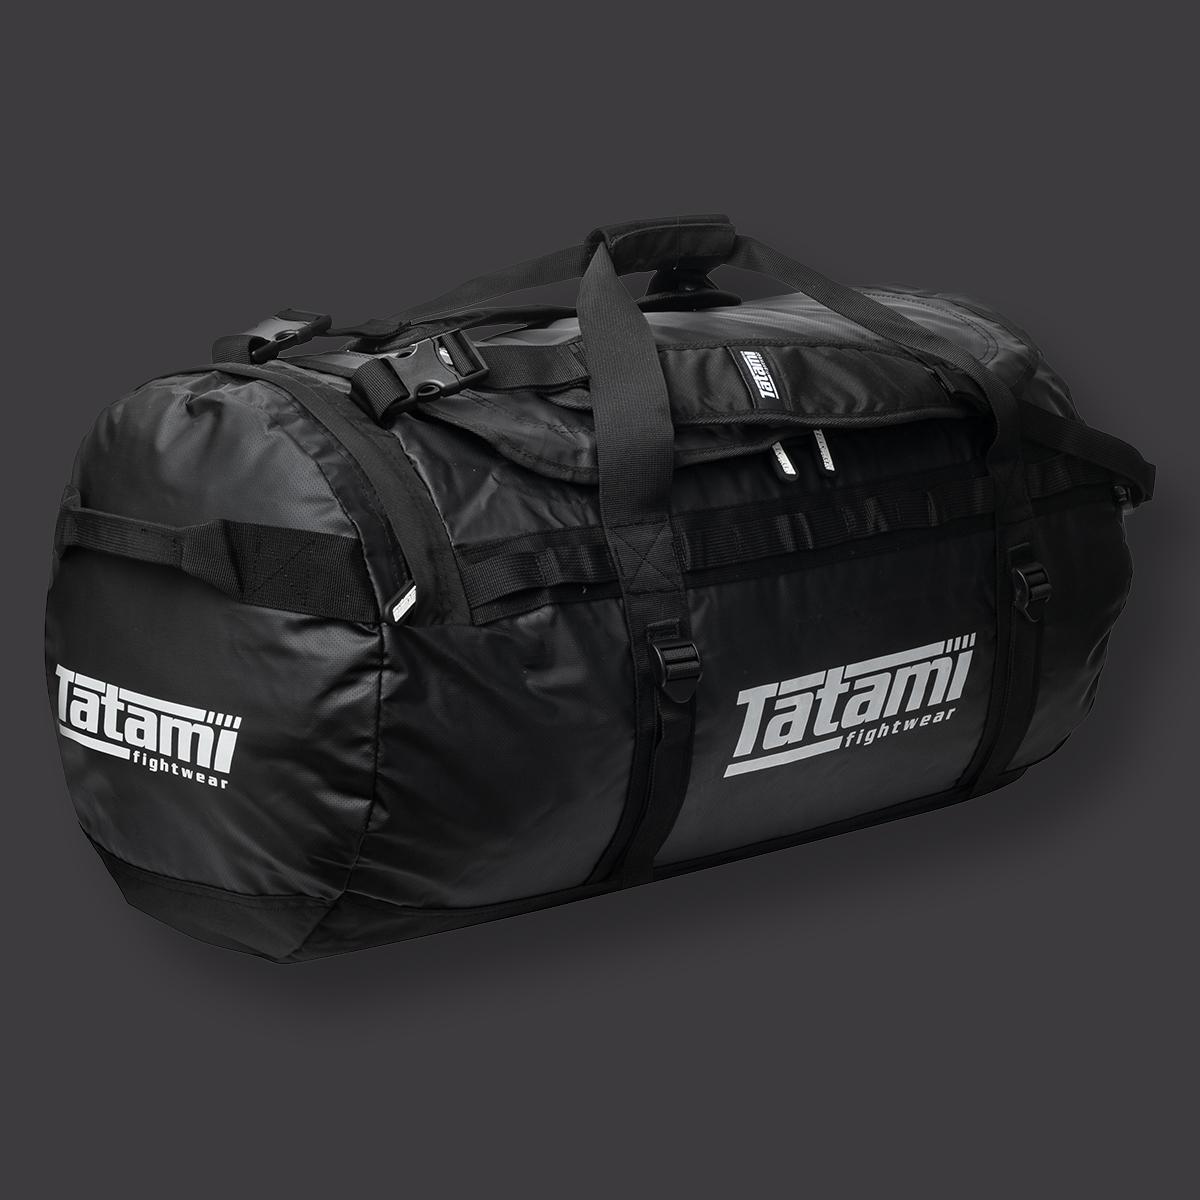 Out now! The Sonkei Gear Bag https://t.co/NnNBKPIvxY https://t.co/DBaRiHwviv